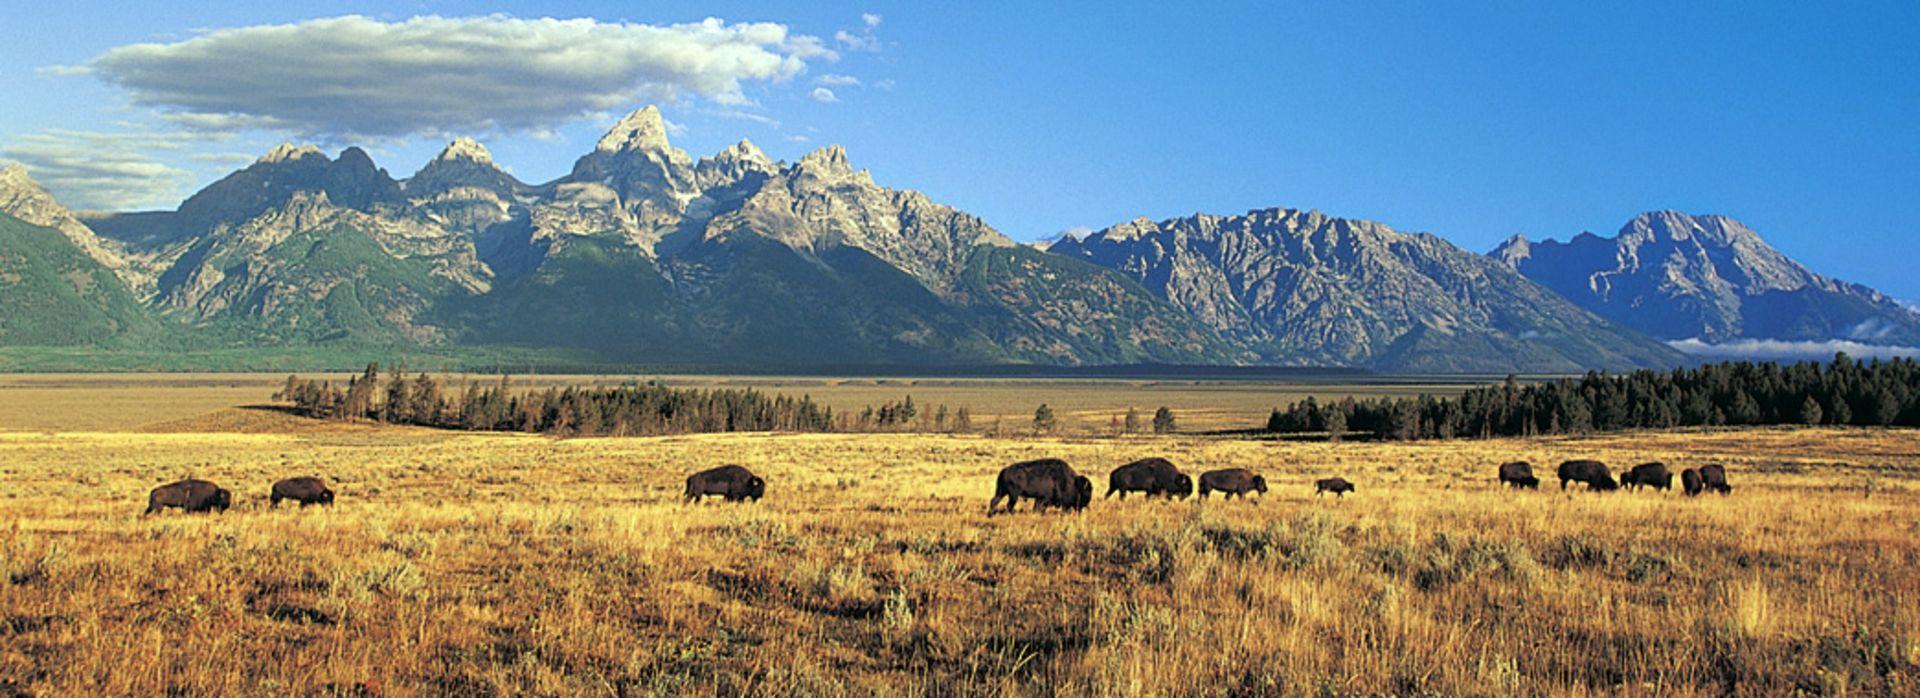 Adventures in the Wild, Wild West